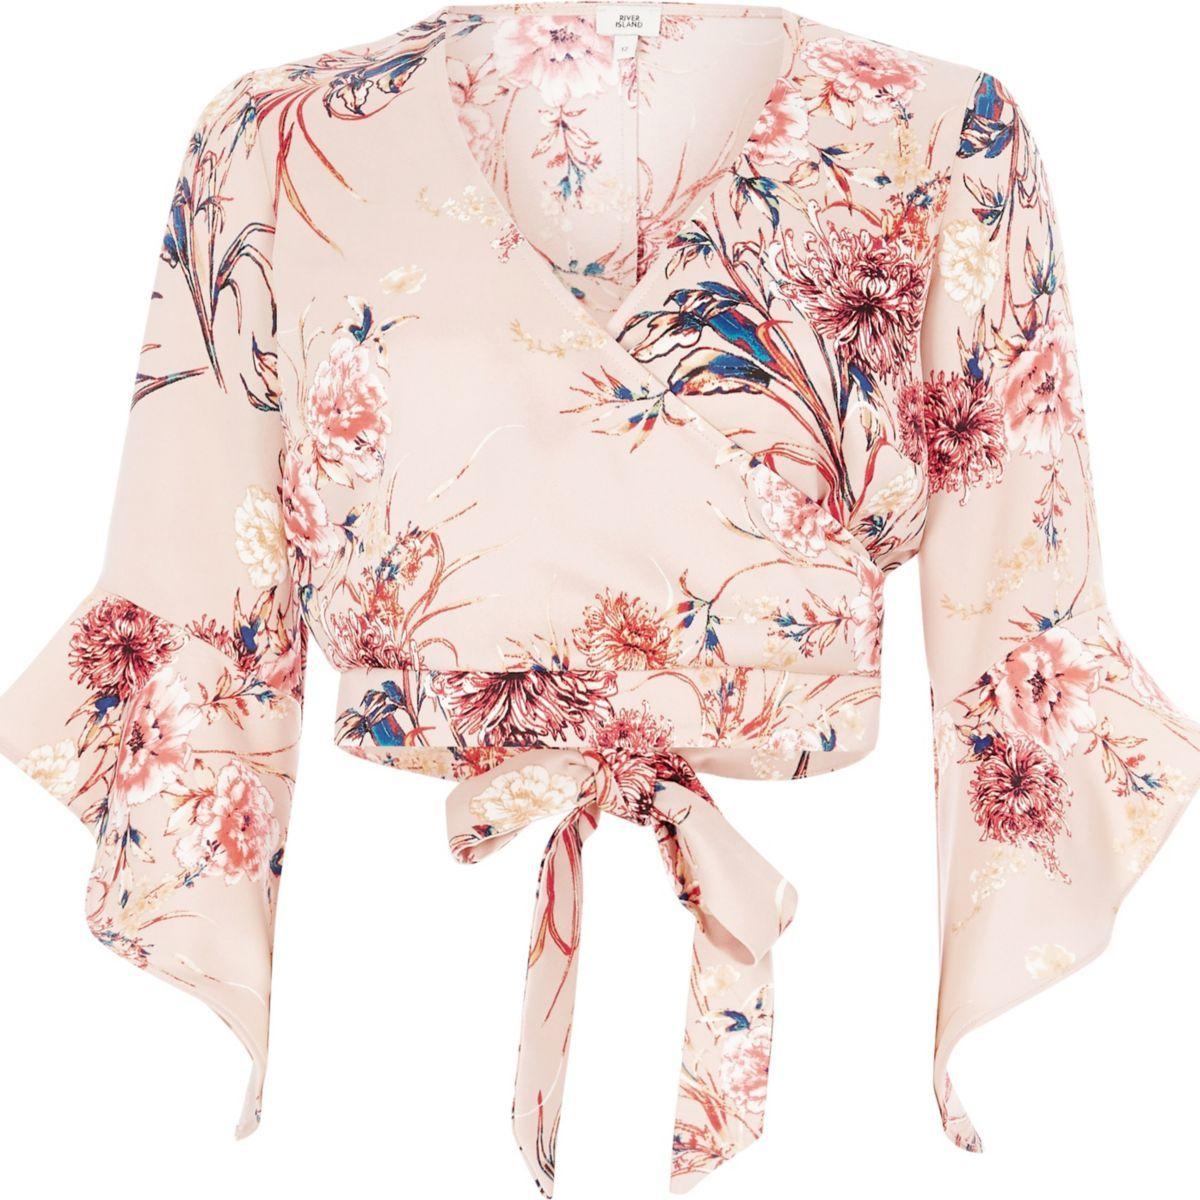 c8cd21e1e31bb Light pink floral wrap flare sleeve crop top - Tops - Sale - women